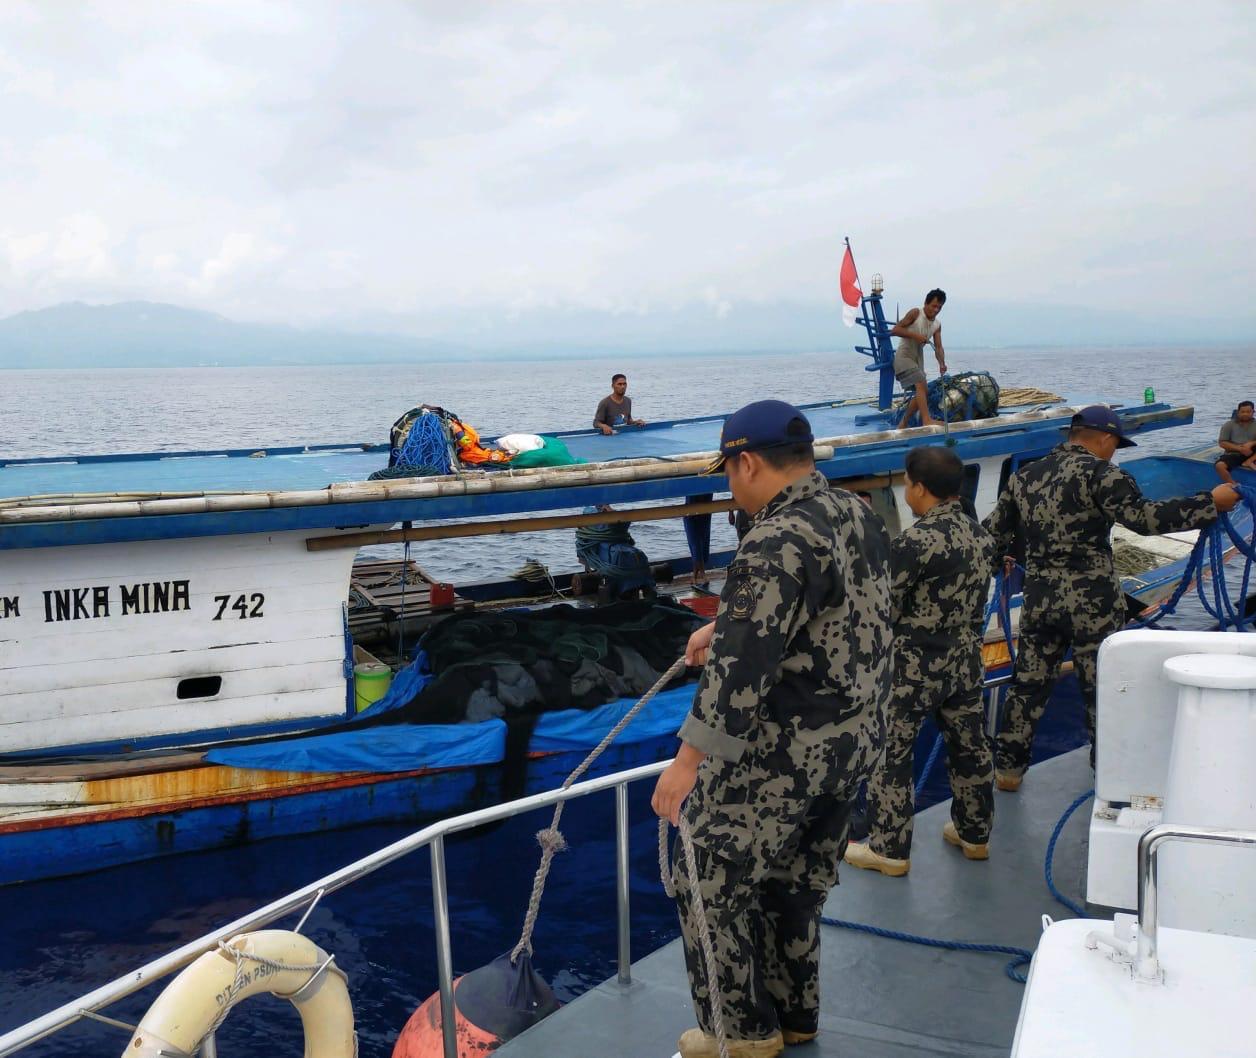 3 Kapal Tak Berizin Diamankan Petugas di Teluk Tolo. Foto: Doc KKP